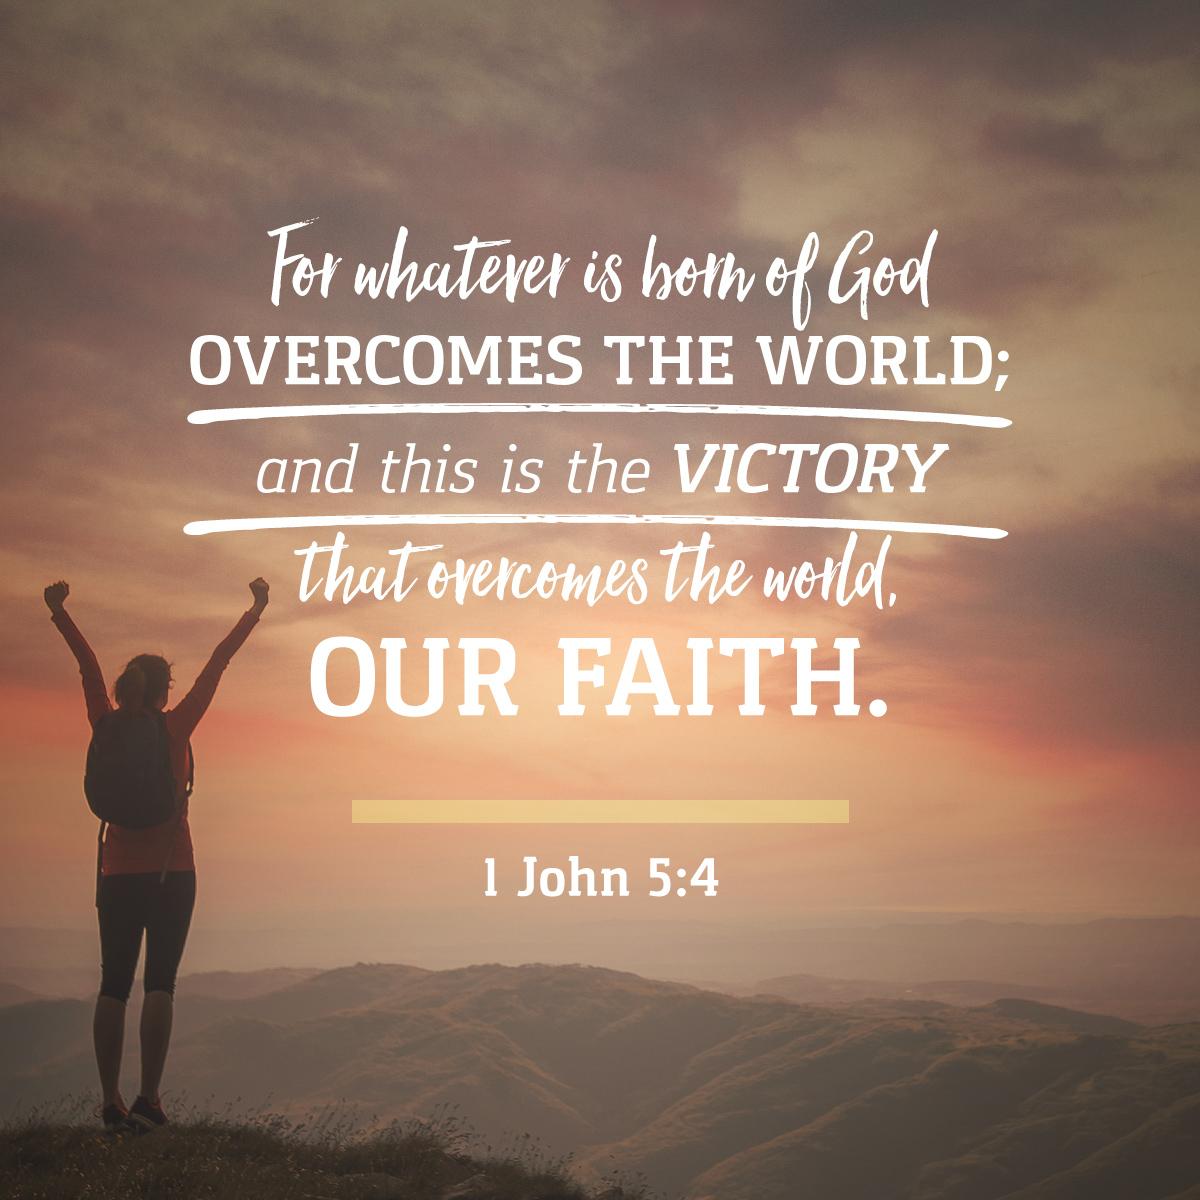 1 John 5:4 - Daily Verse